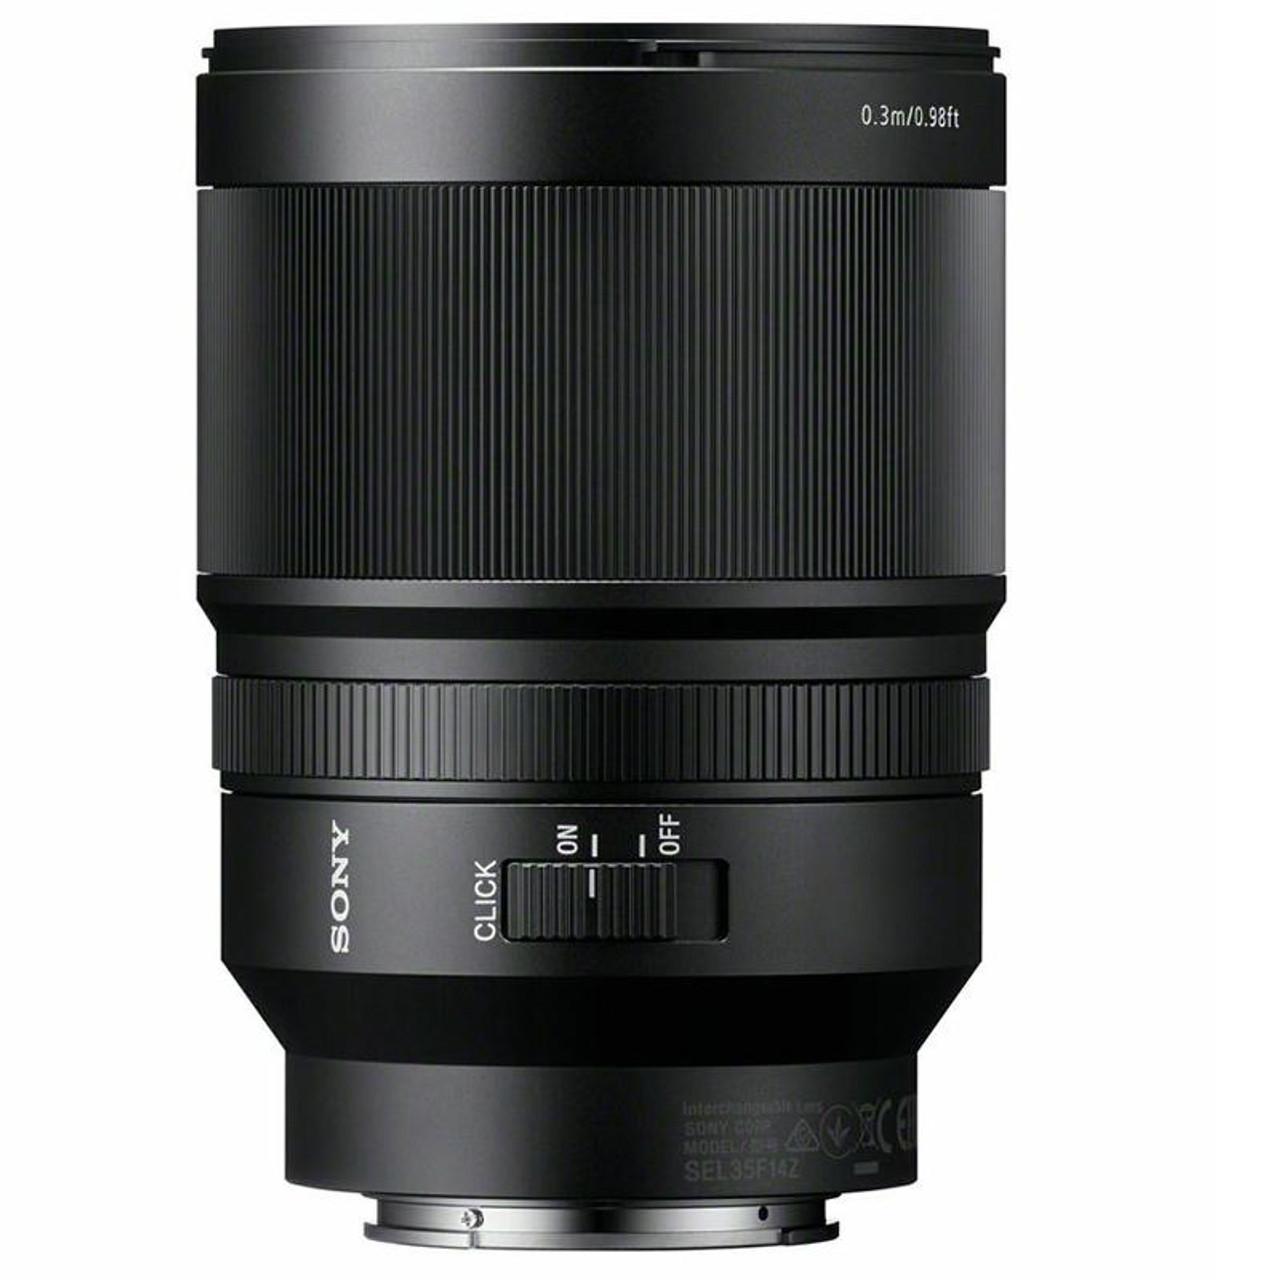 Sony Carl Zeiss Distagon T* FE 35mm F/1.4 ZA Full Frame E-mount NEX ...